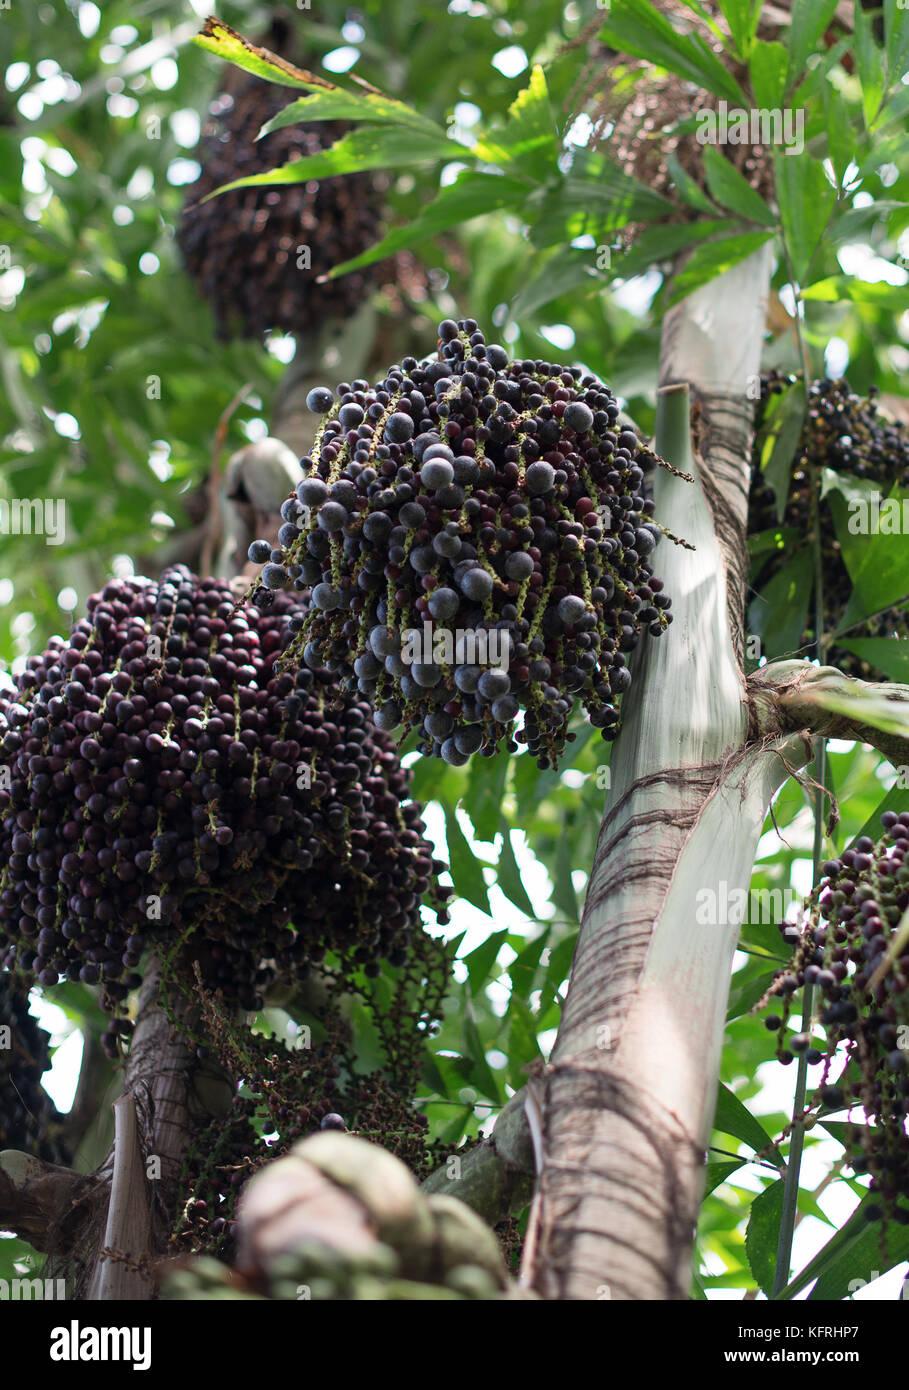 Acai berries on palm tree. Euterpe oleracea.Stock Photo